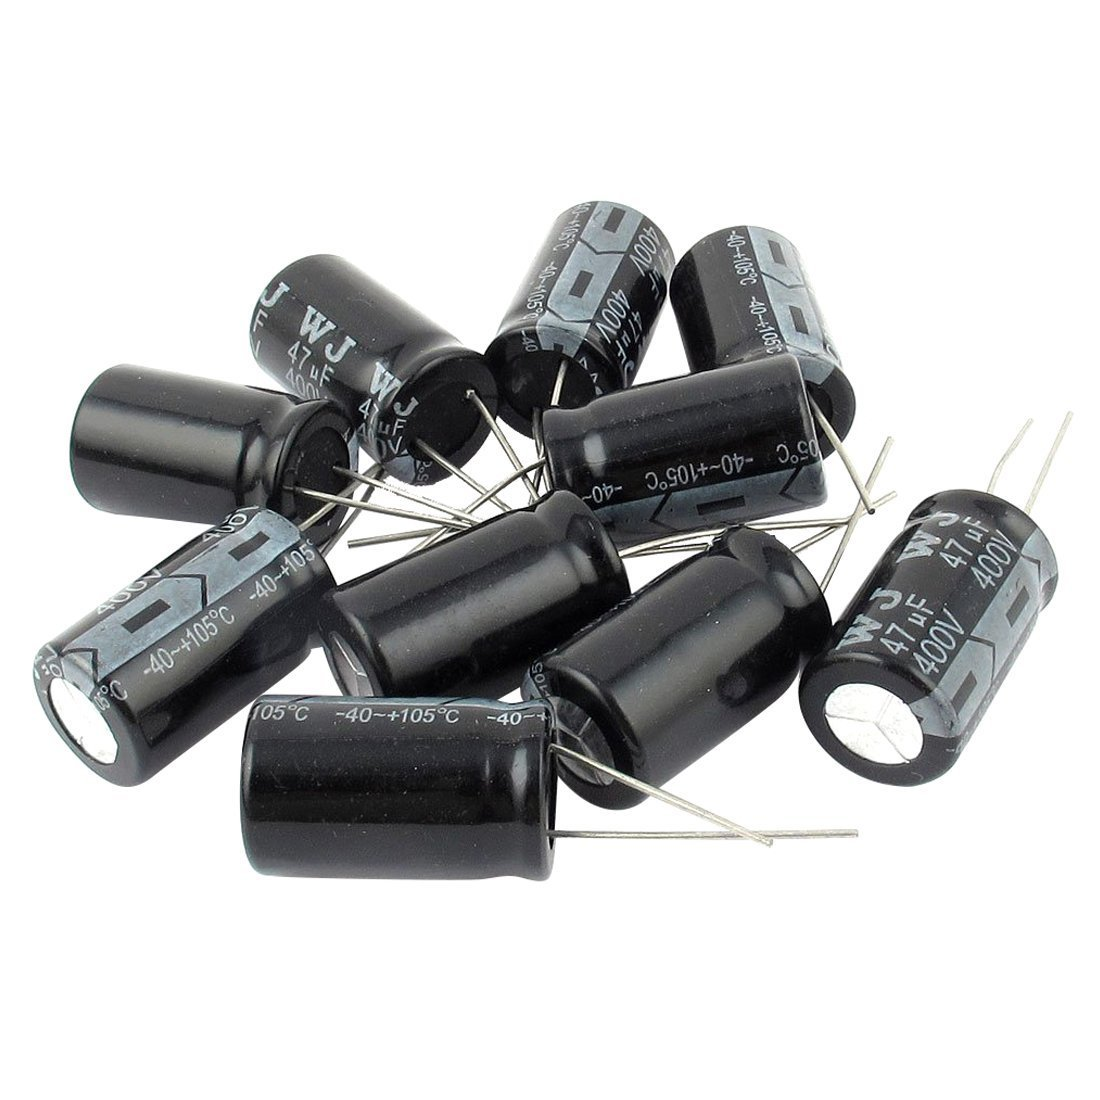 Electrolytic Capacitor - SODIAL(R) 10 Pcs 400V 47uF 105C Radial Lead Electrolytic Capacitor 16mm x 25mm